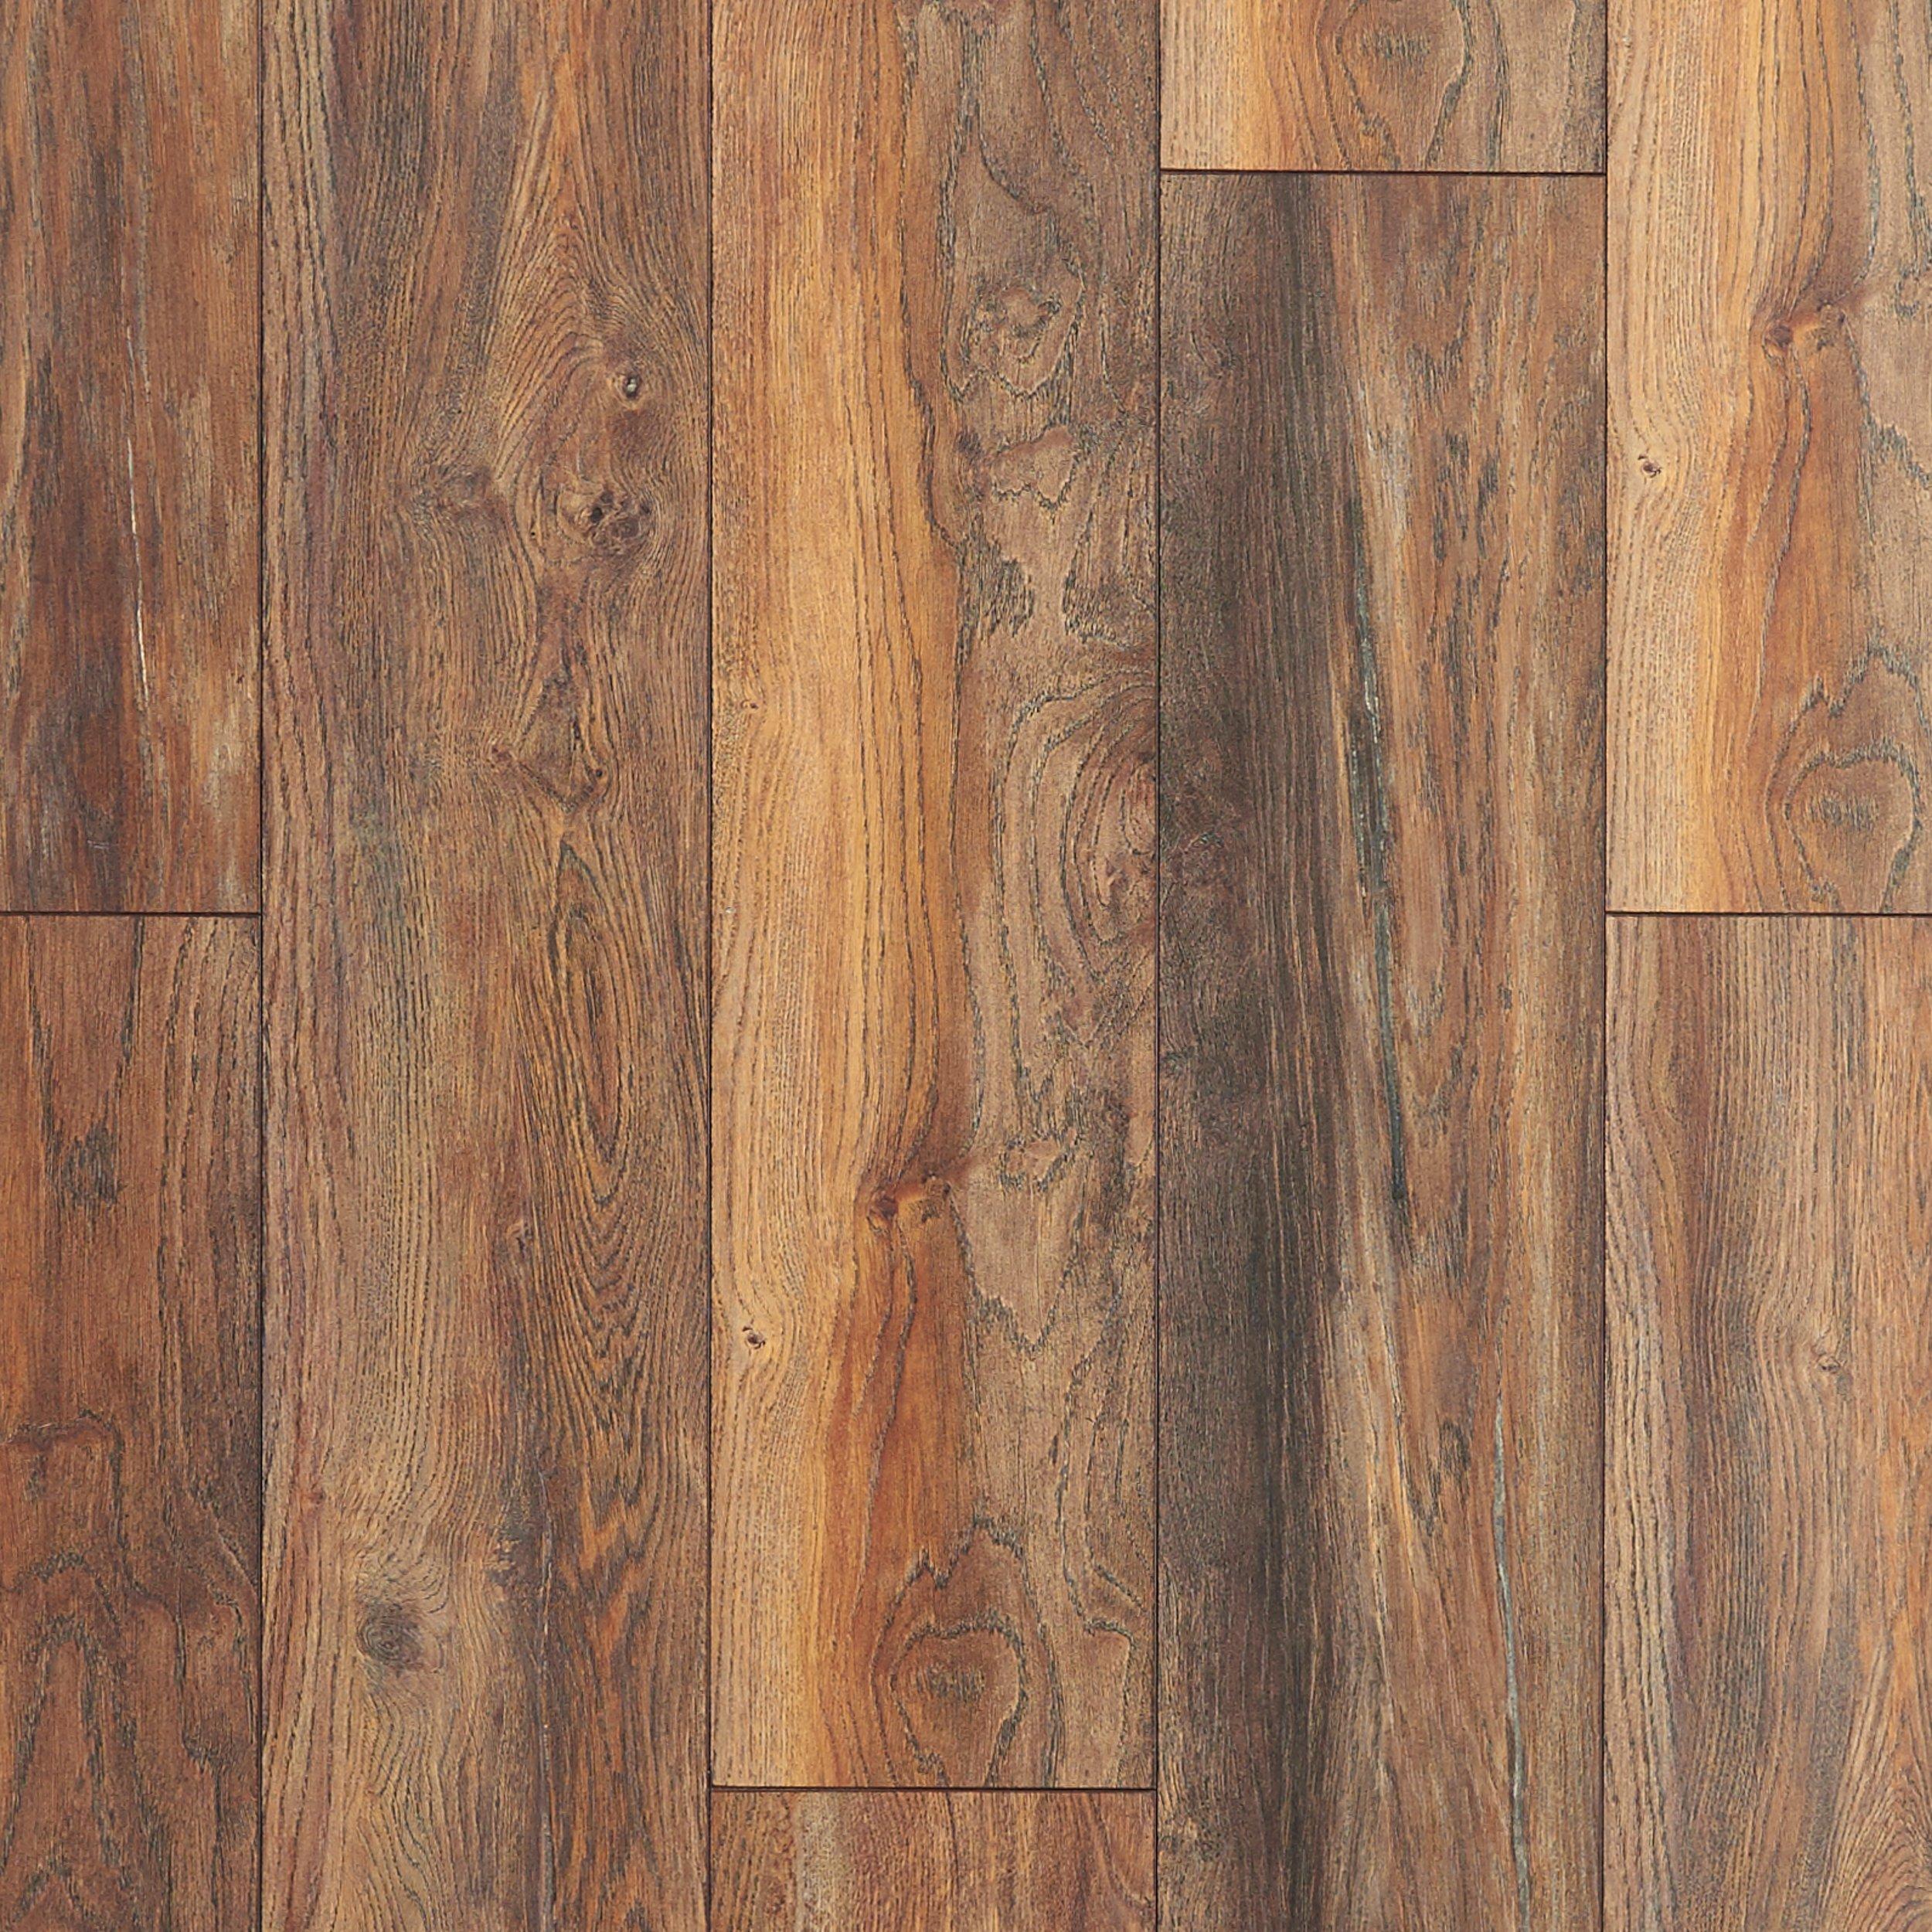 water resistant laminate flooring kitchen compost bin for american spirit port chester oak - 12mm ...